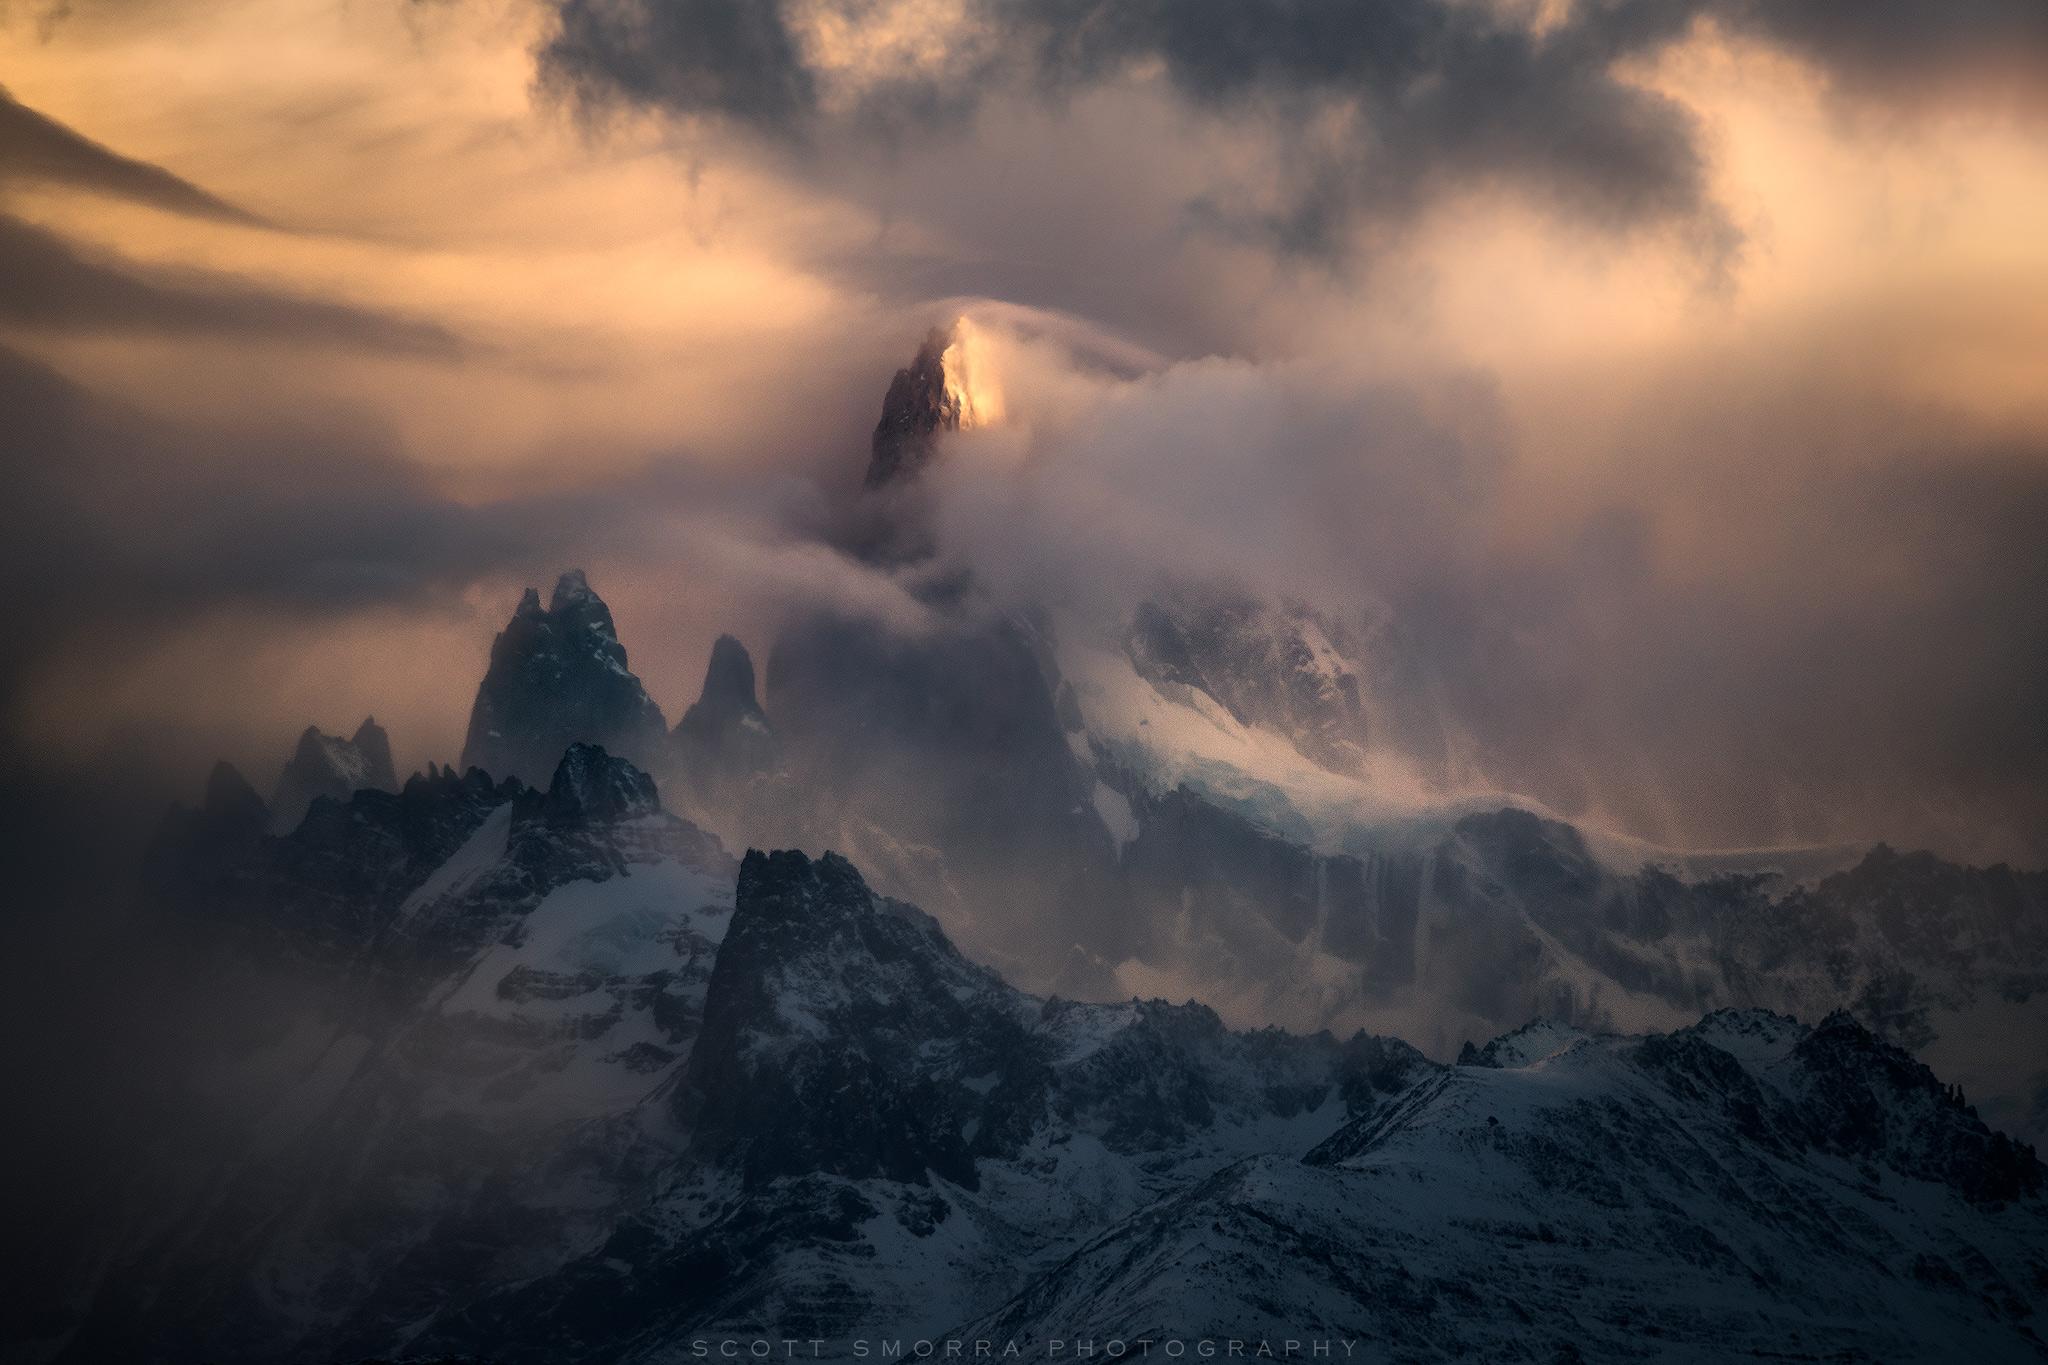 Patagonia, Argentina, Mountains, atmosphere, wind, Aguaja, Poincenot, sunrise, Parque Nacional Los Glaciares, drama, clouds, snow, photo